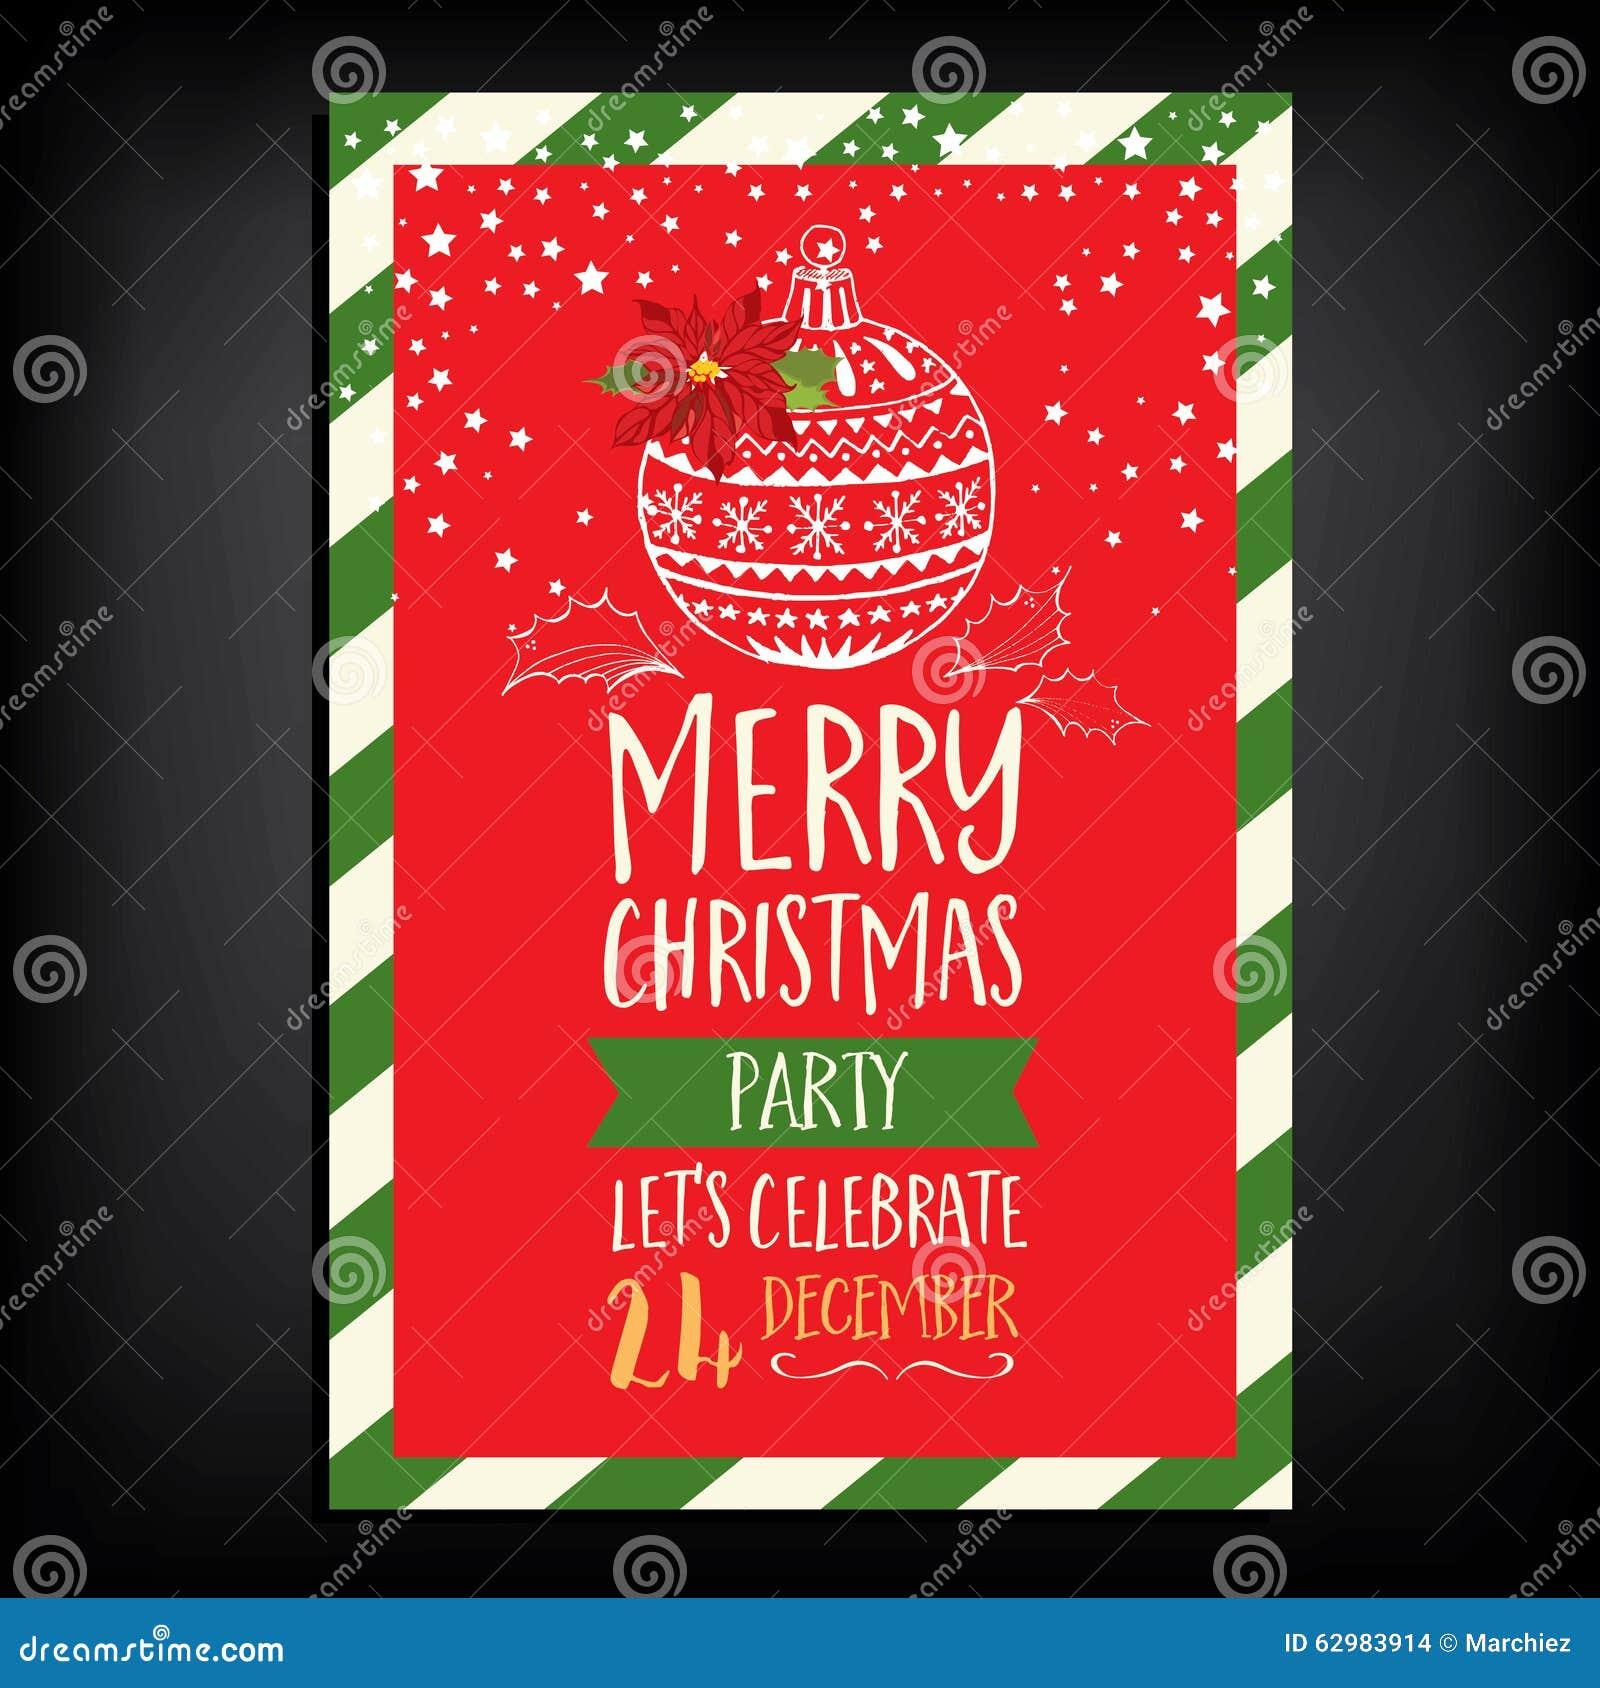 Christmas party invitation restaurant food flyer stock vector christmas party invitation restaurant food flyer stopboris Images